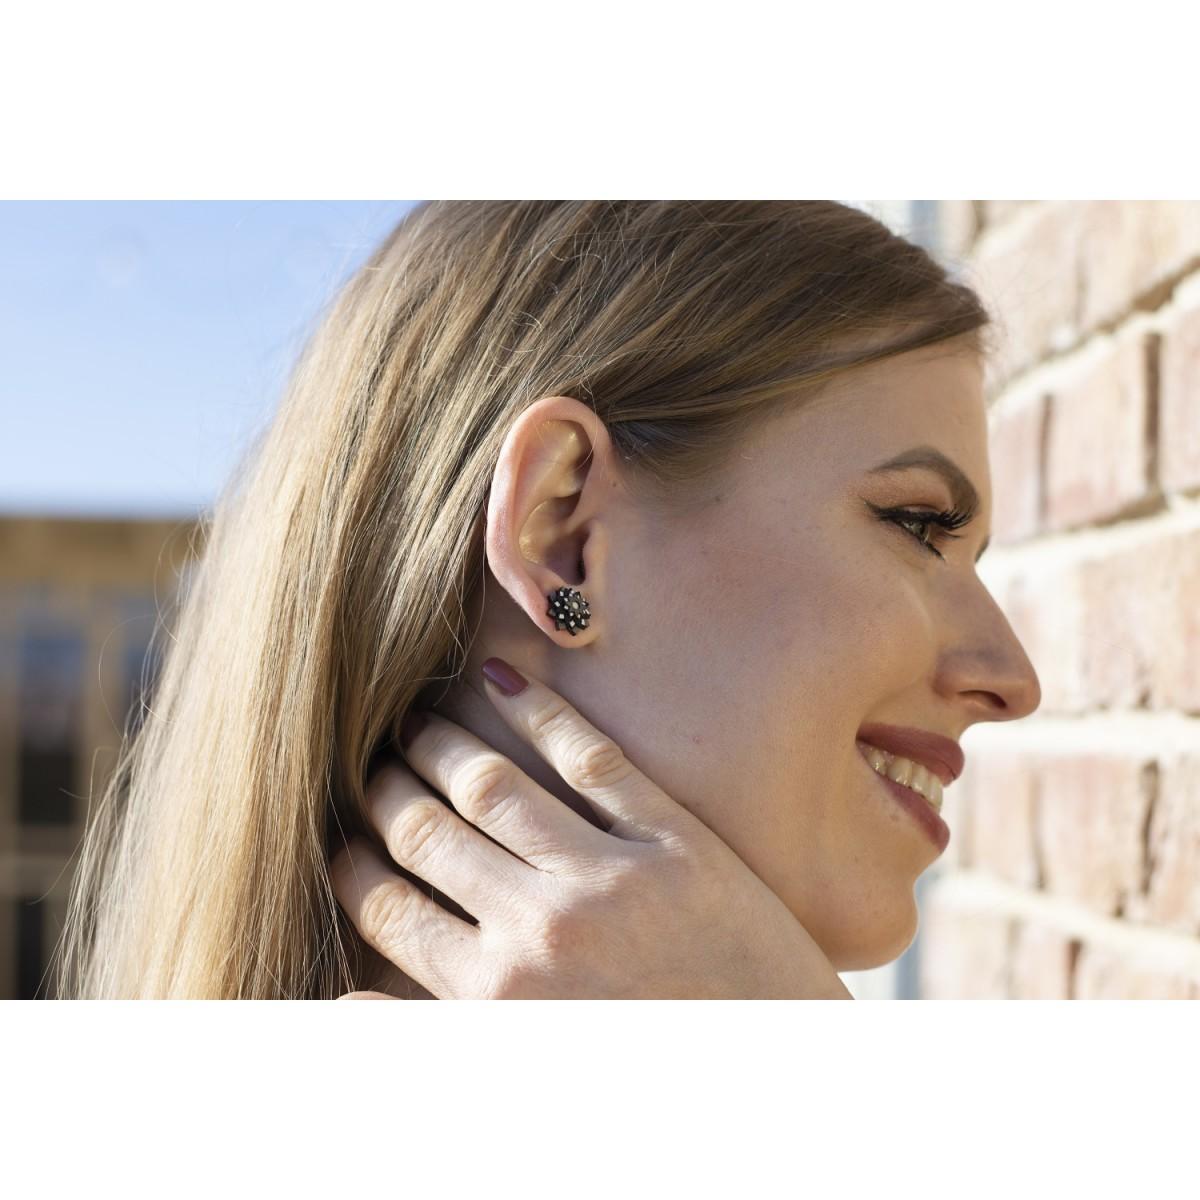 BeWooden Ohrringe - Ohrstecker mit Holzdetail - Motiv Blume - Nox Star Flower Earrings